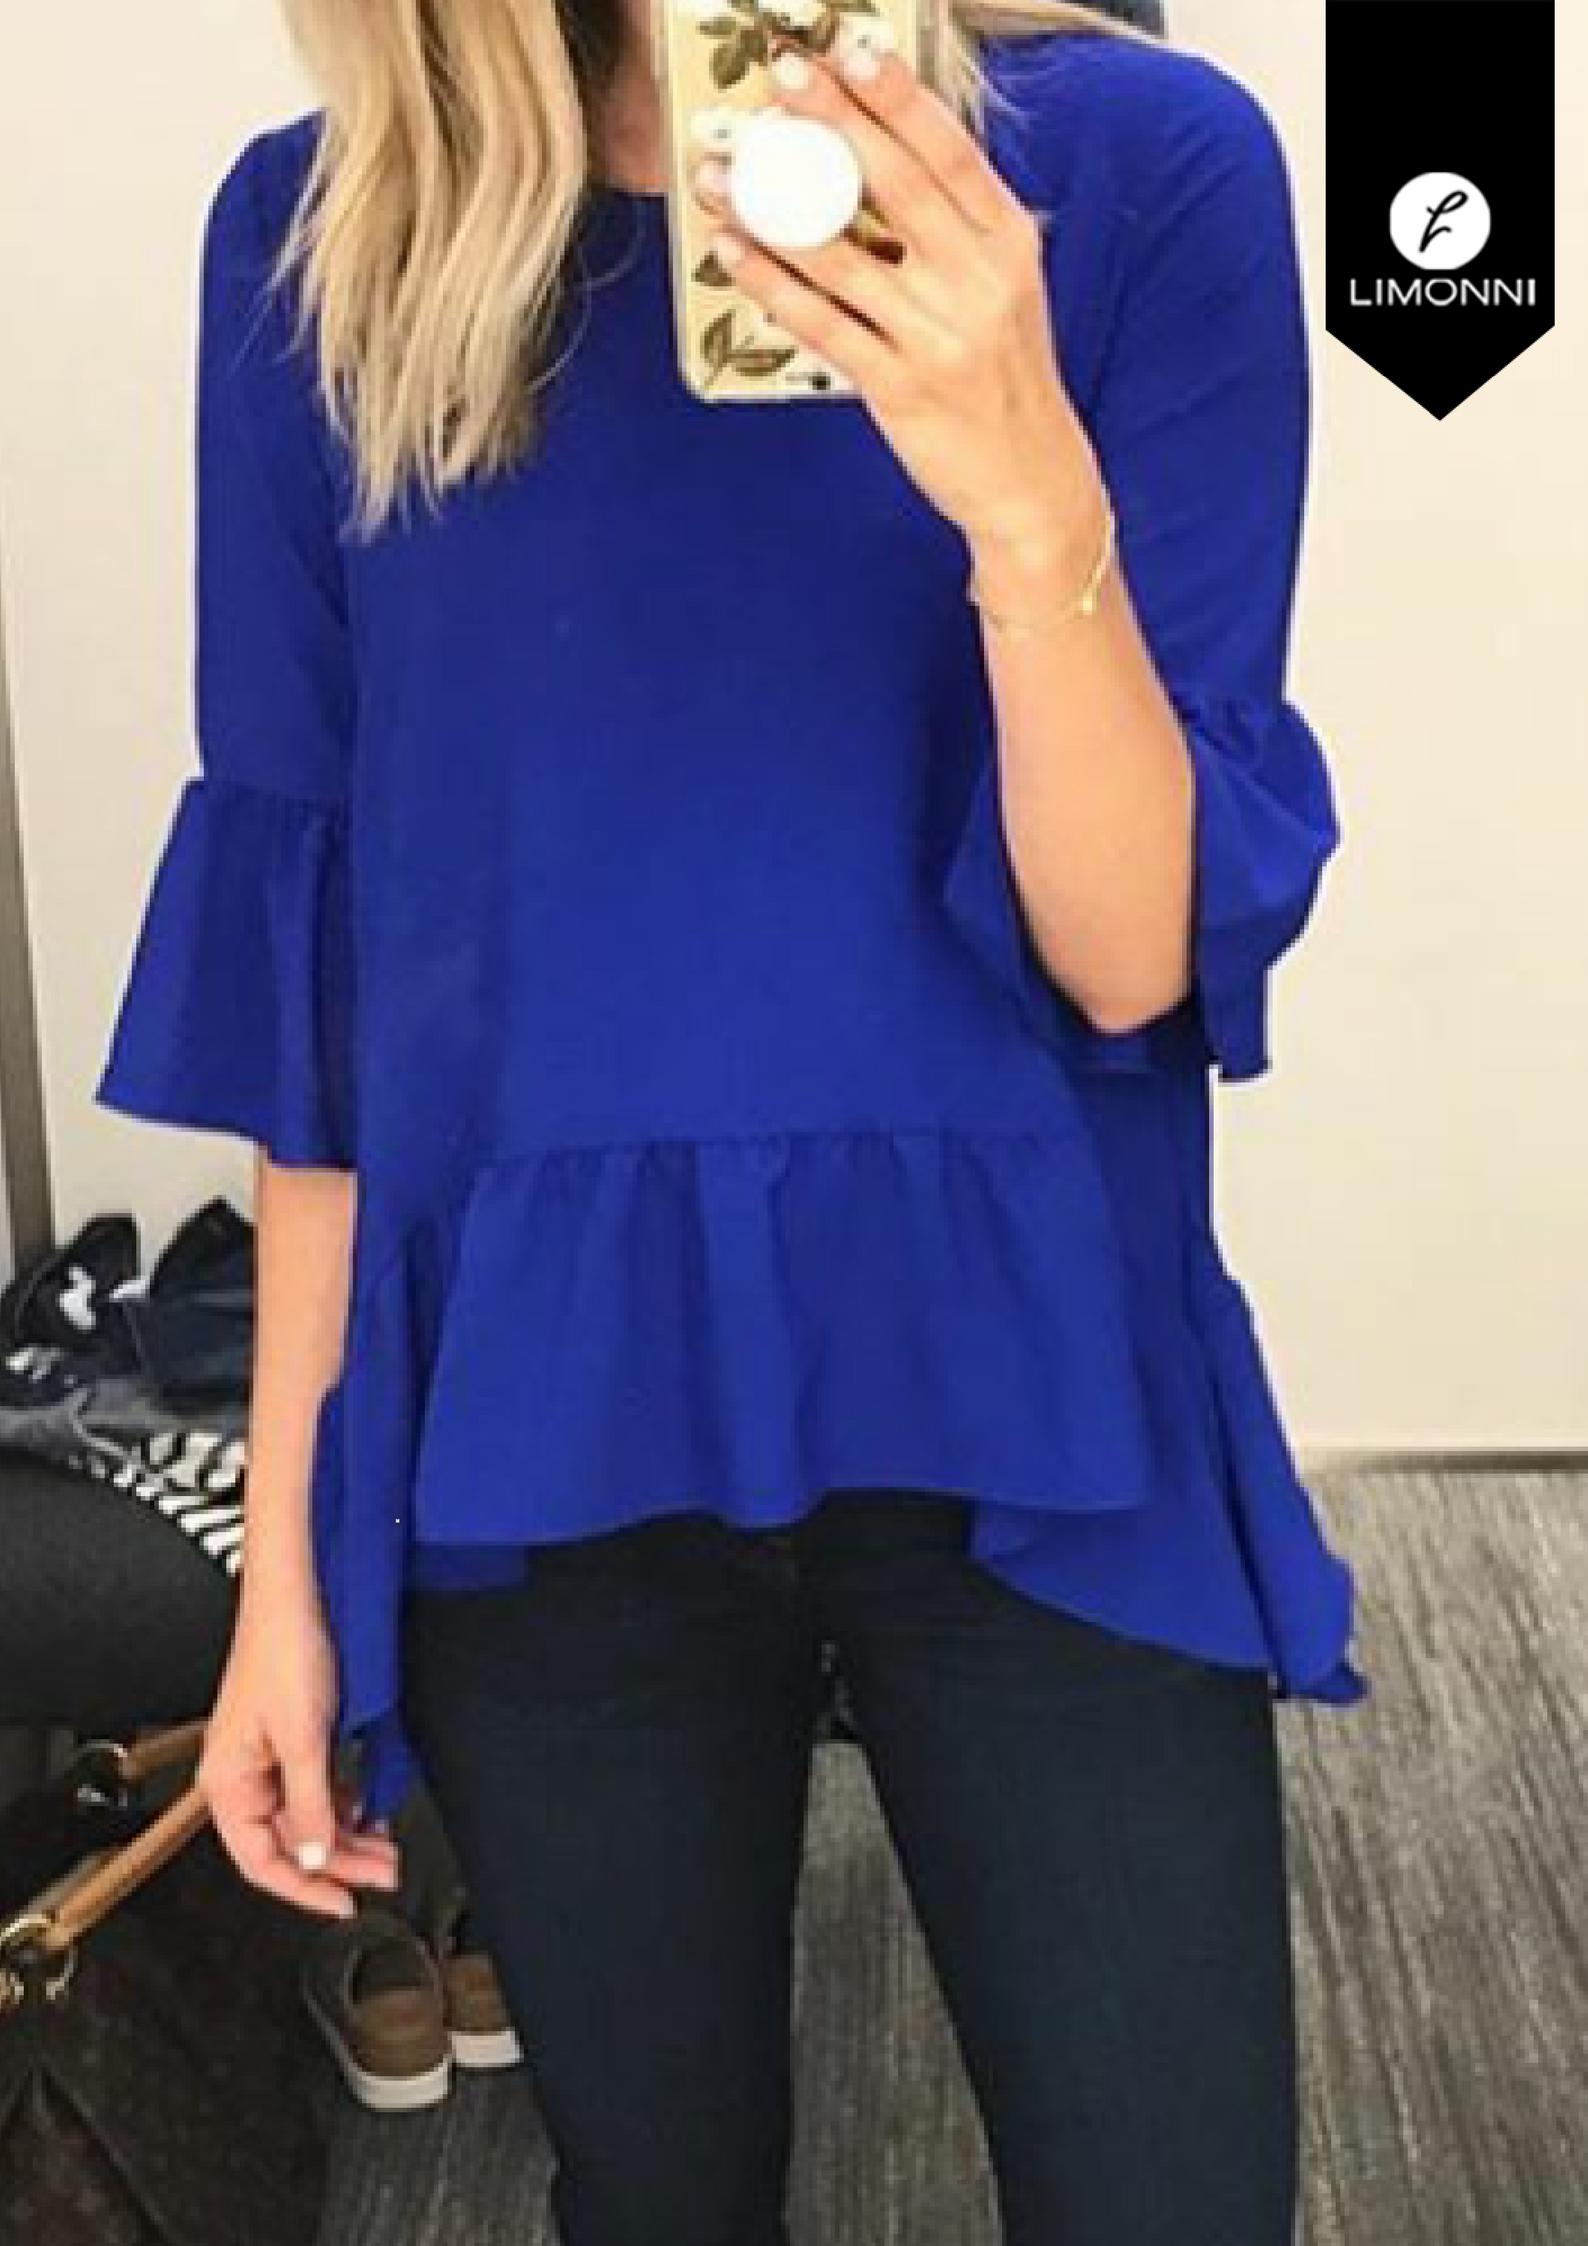 Blusas para mujer Limonni Bennett LI1380 Campesinas